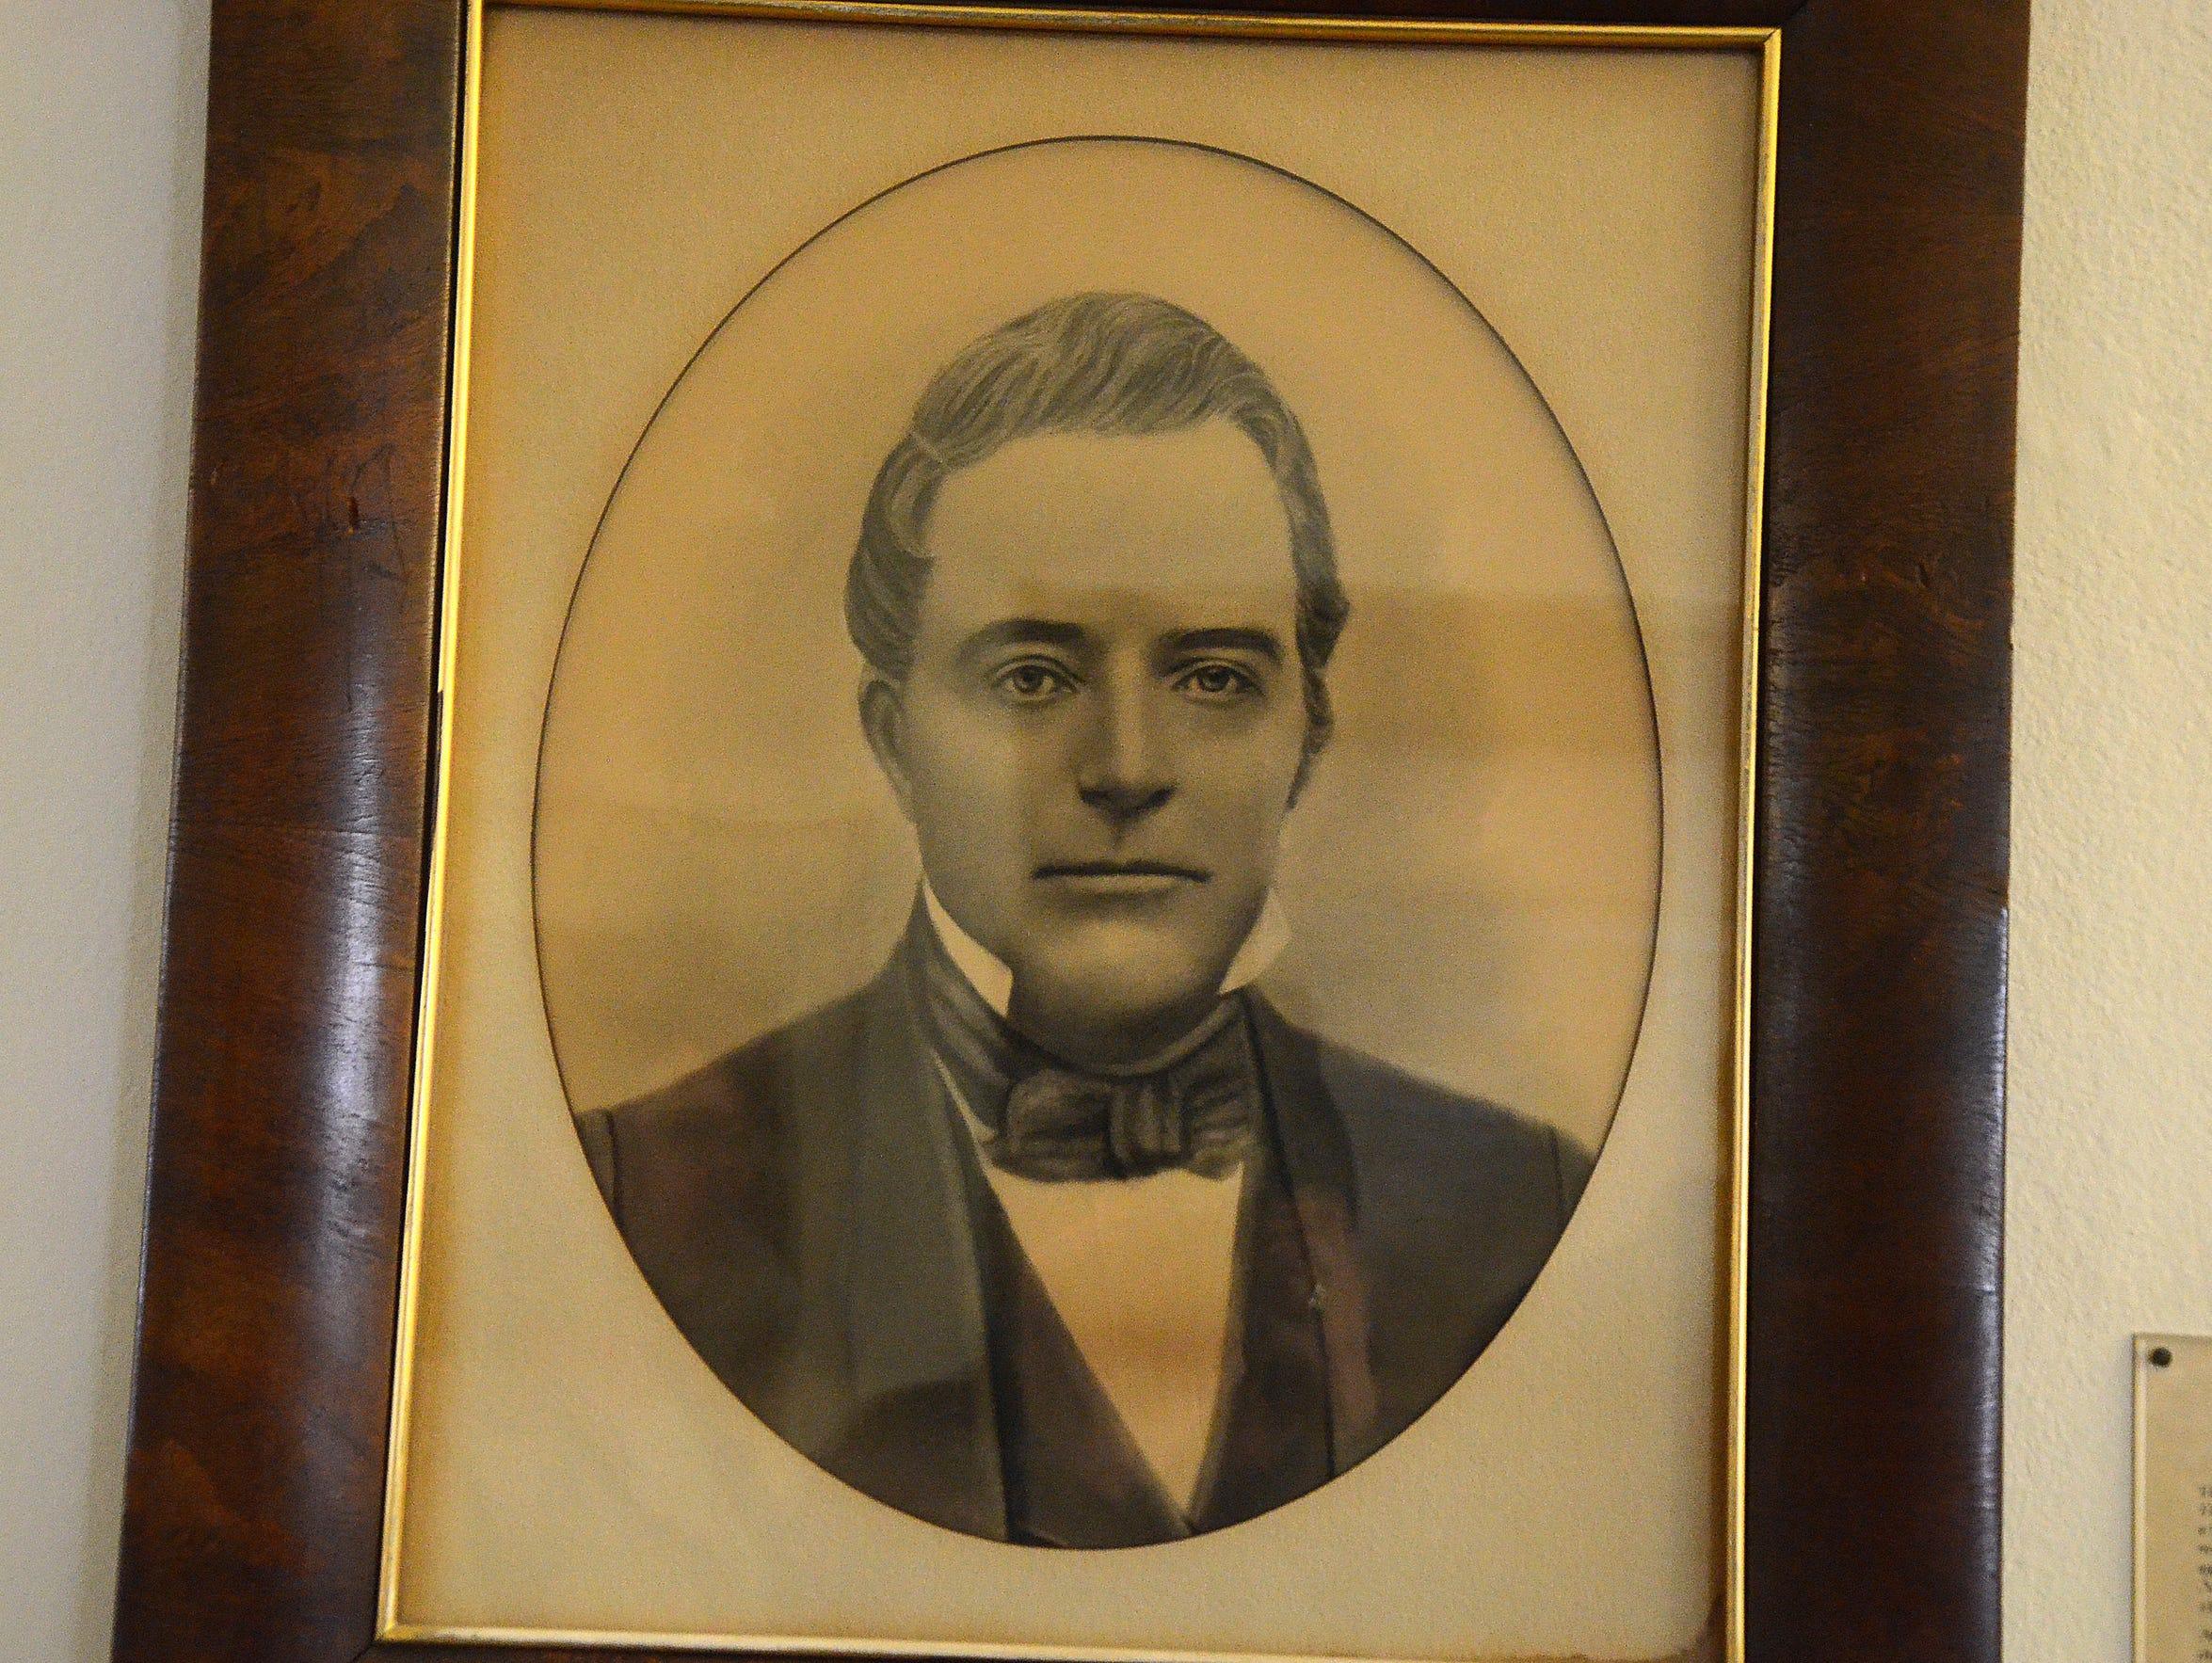 A portrait of Elijah Pendill hangs in City Hall. Pendill